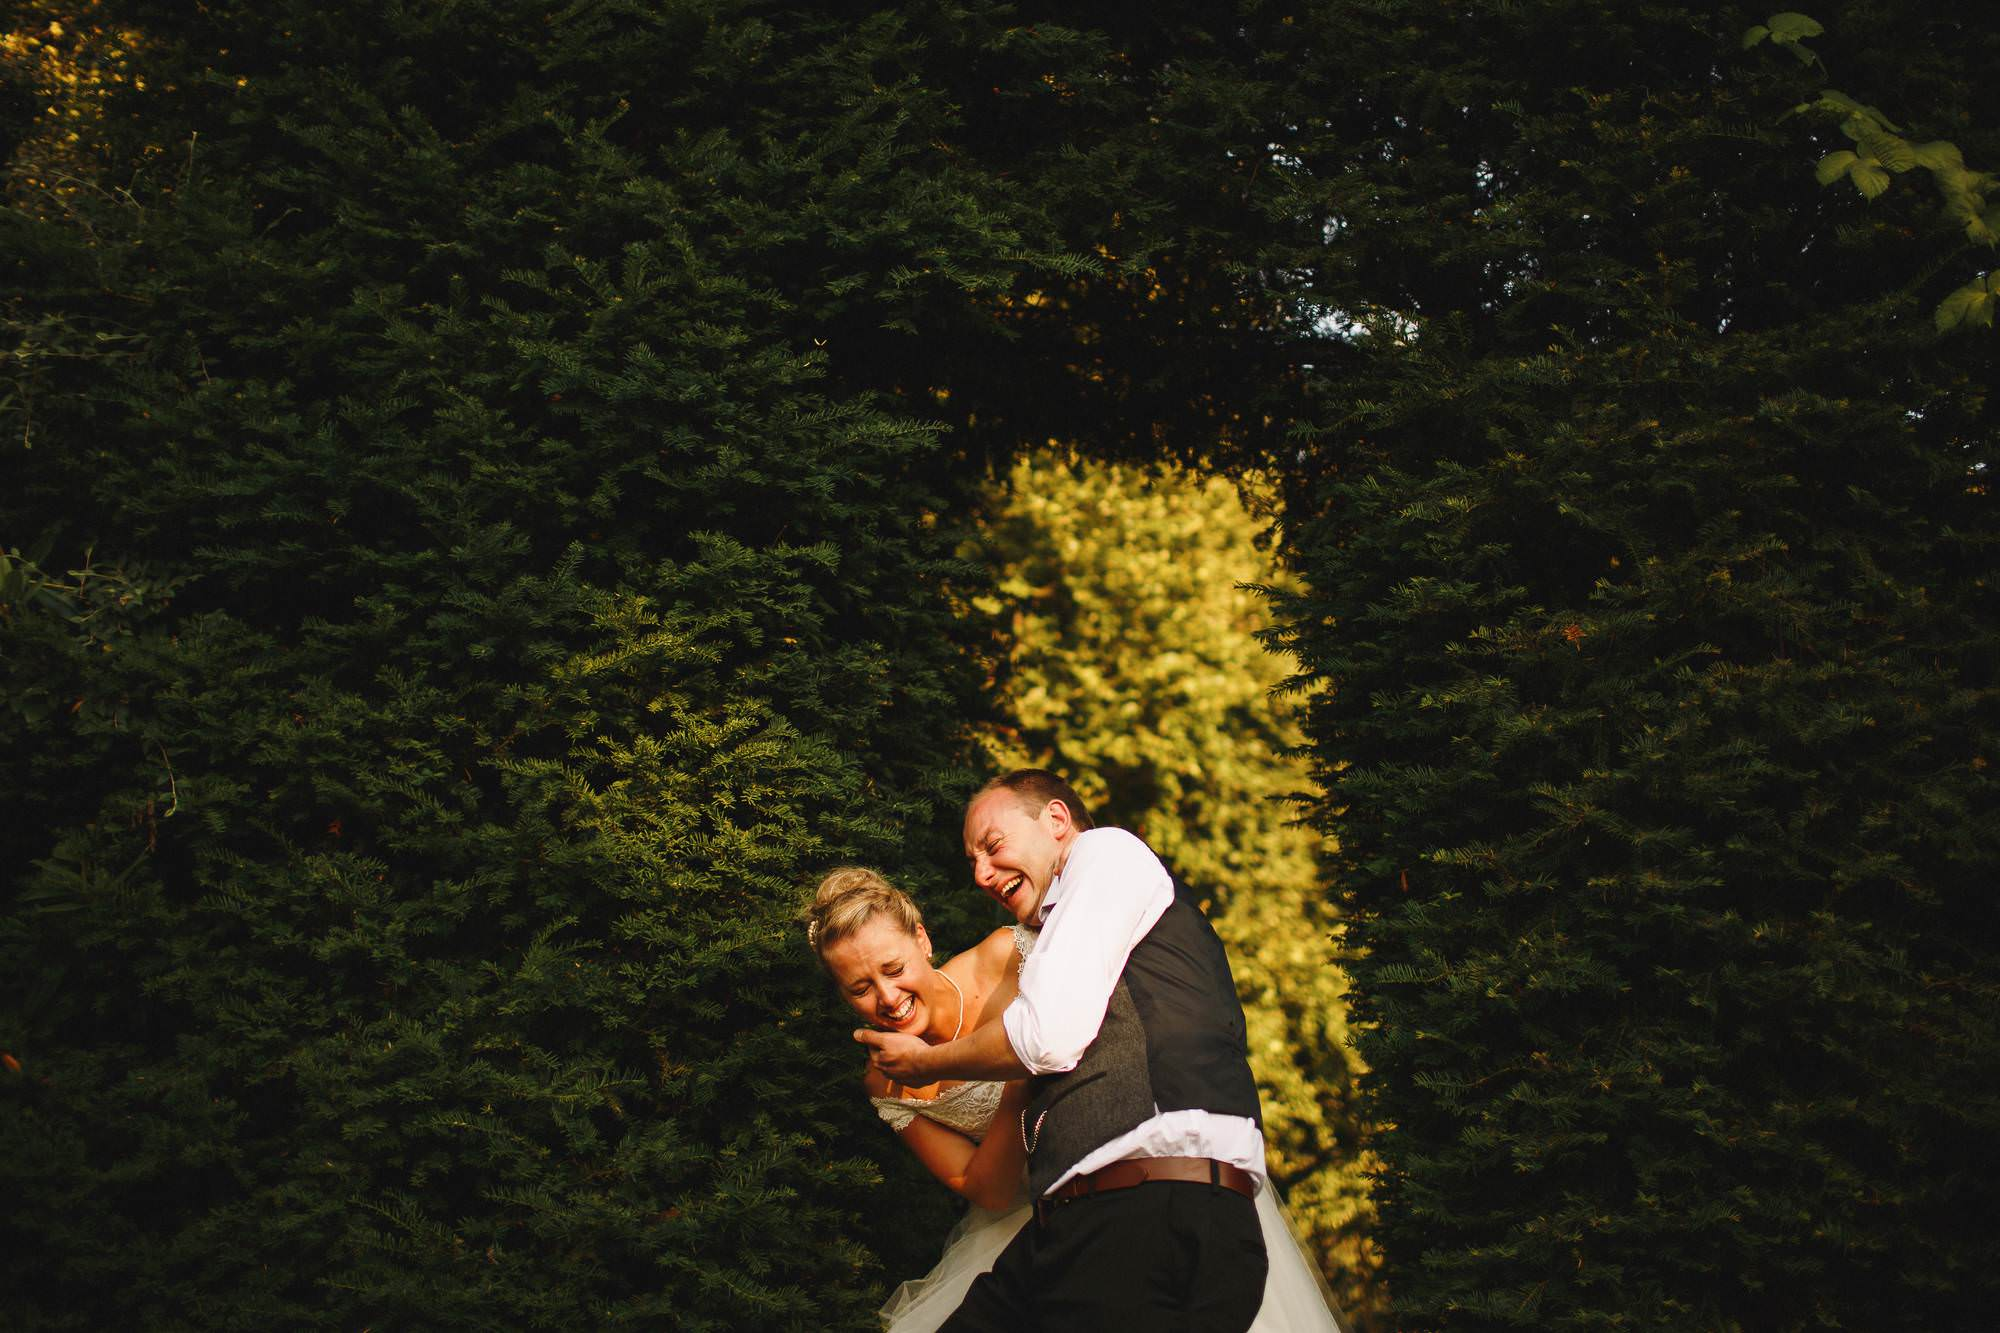 Cheshire wedding photography UK - Nunsmere Hall